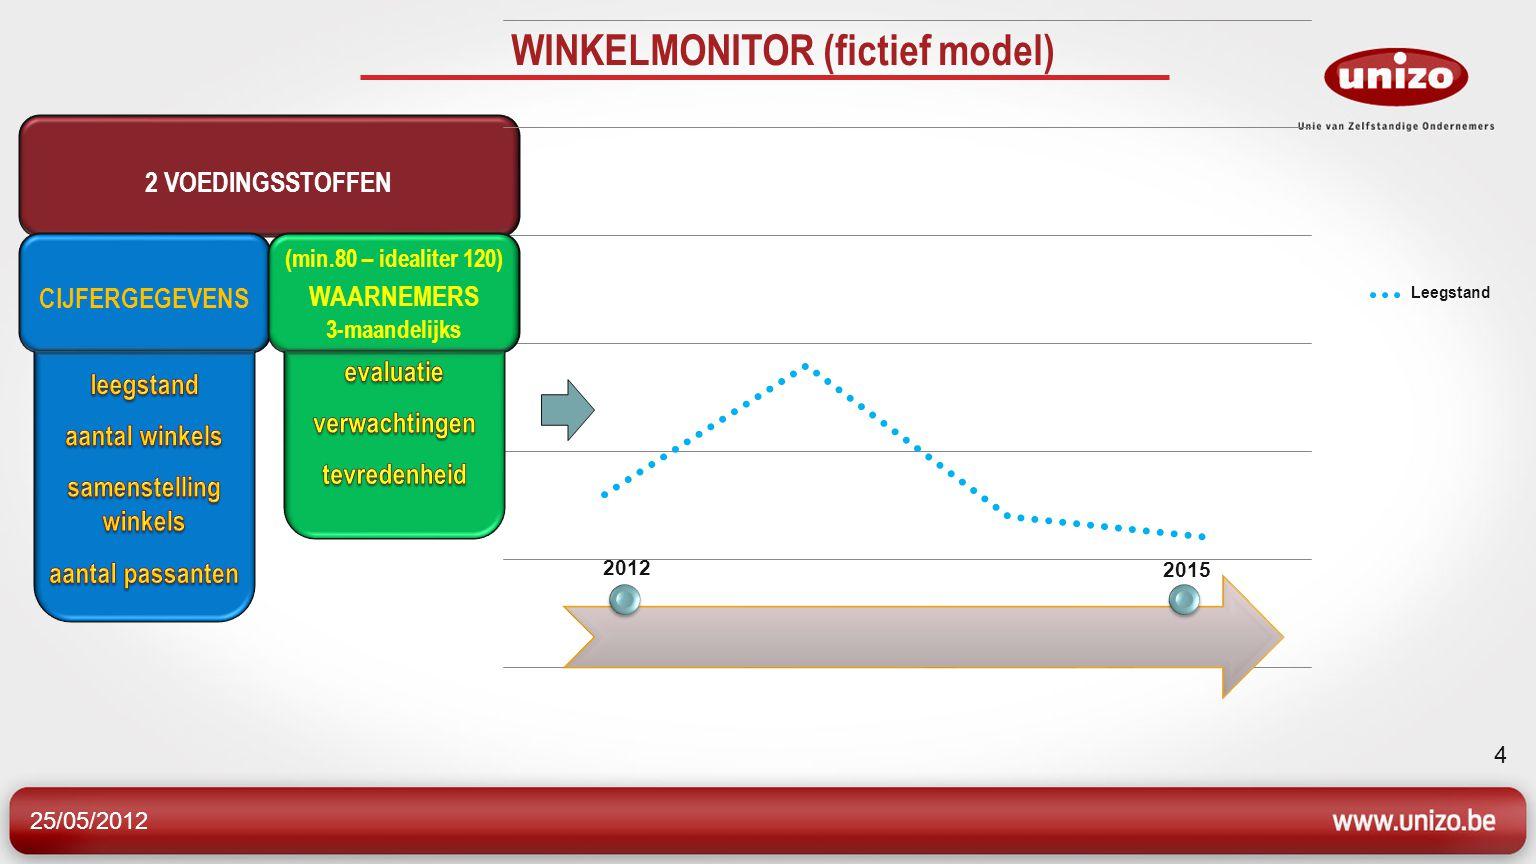 4 2 VOEDINGSSTOFFEN WINKELMONITOR (fictief model) 2012 2015 CIJFERGEGEVENS (min.80 – idealiter 120) WAARNEMERS 3-maandelijks